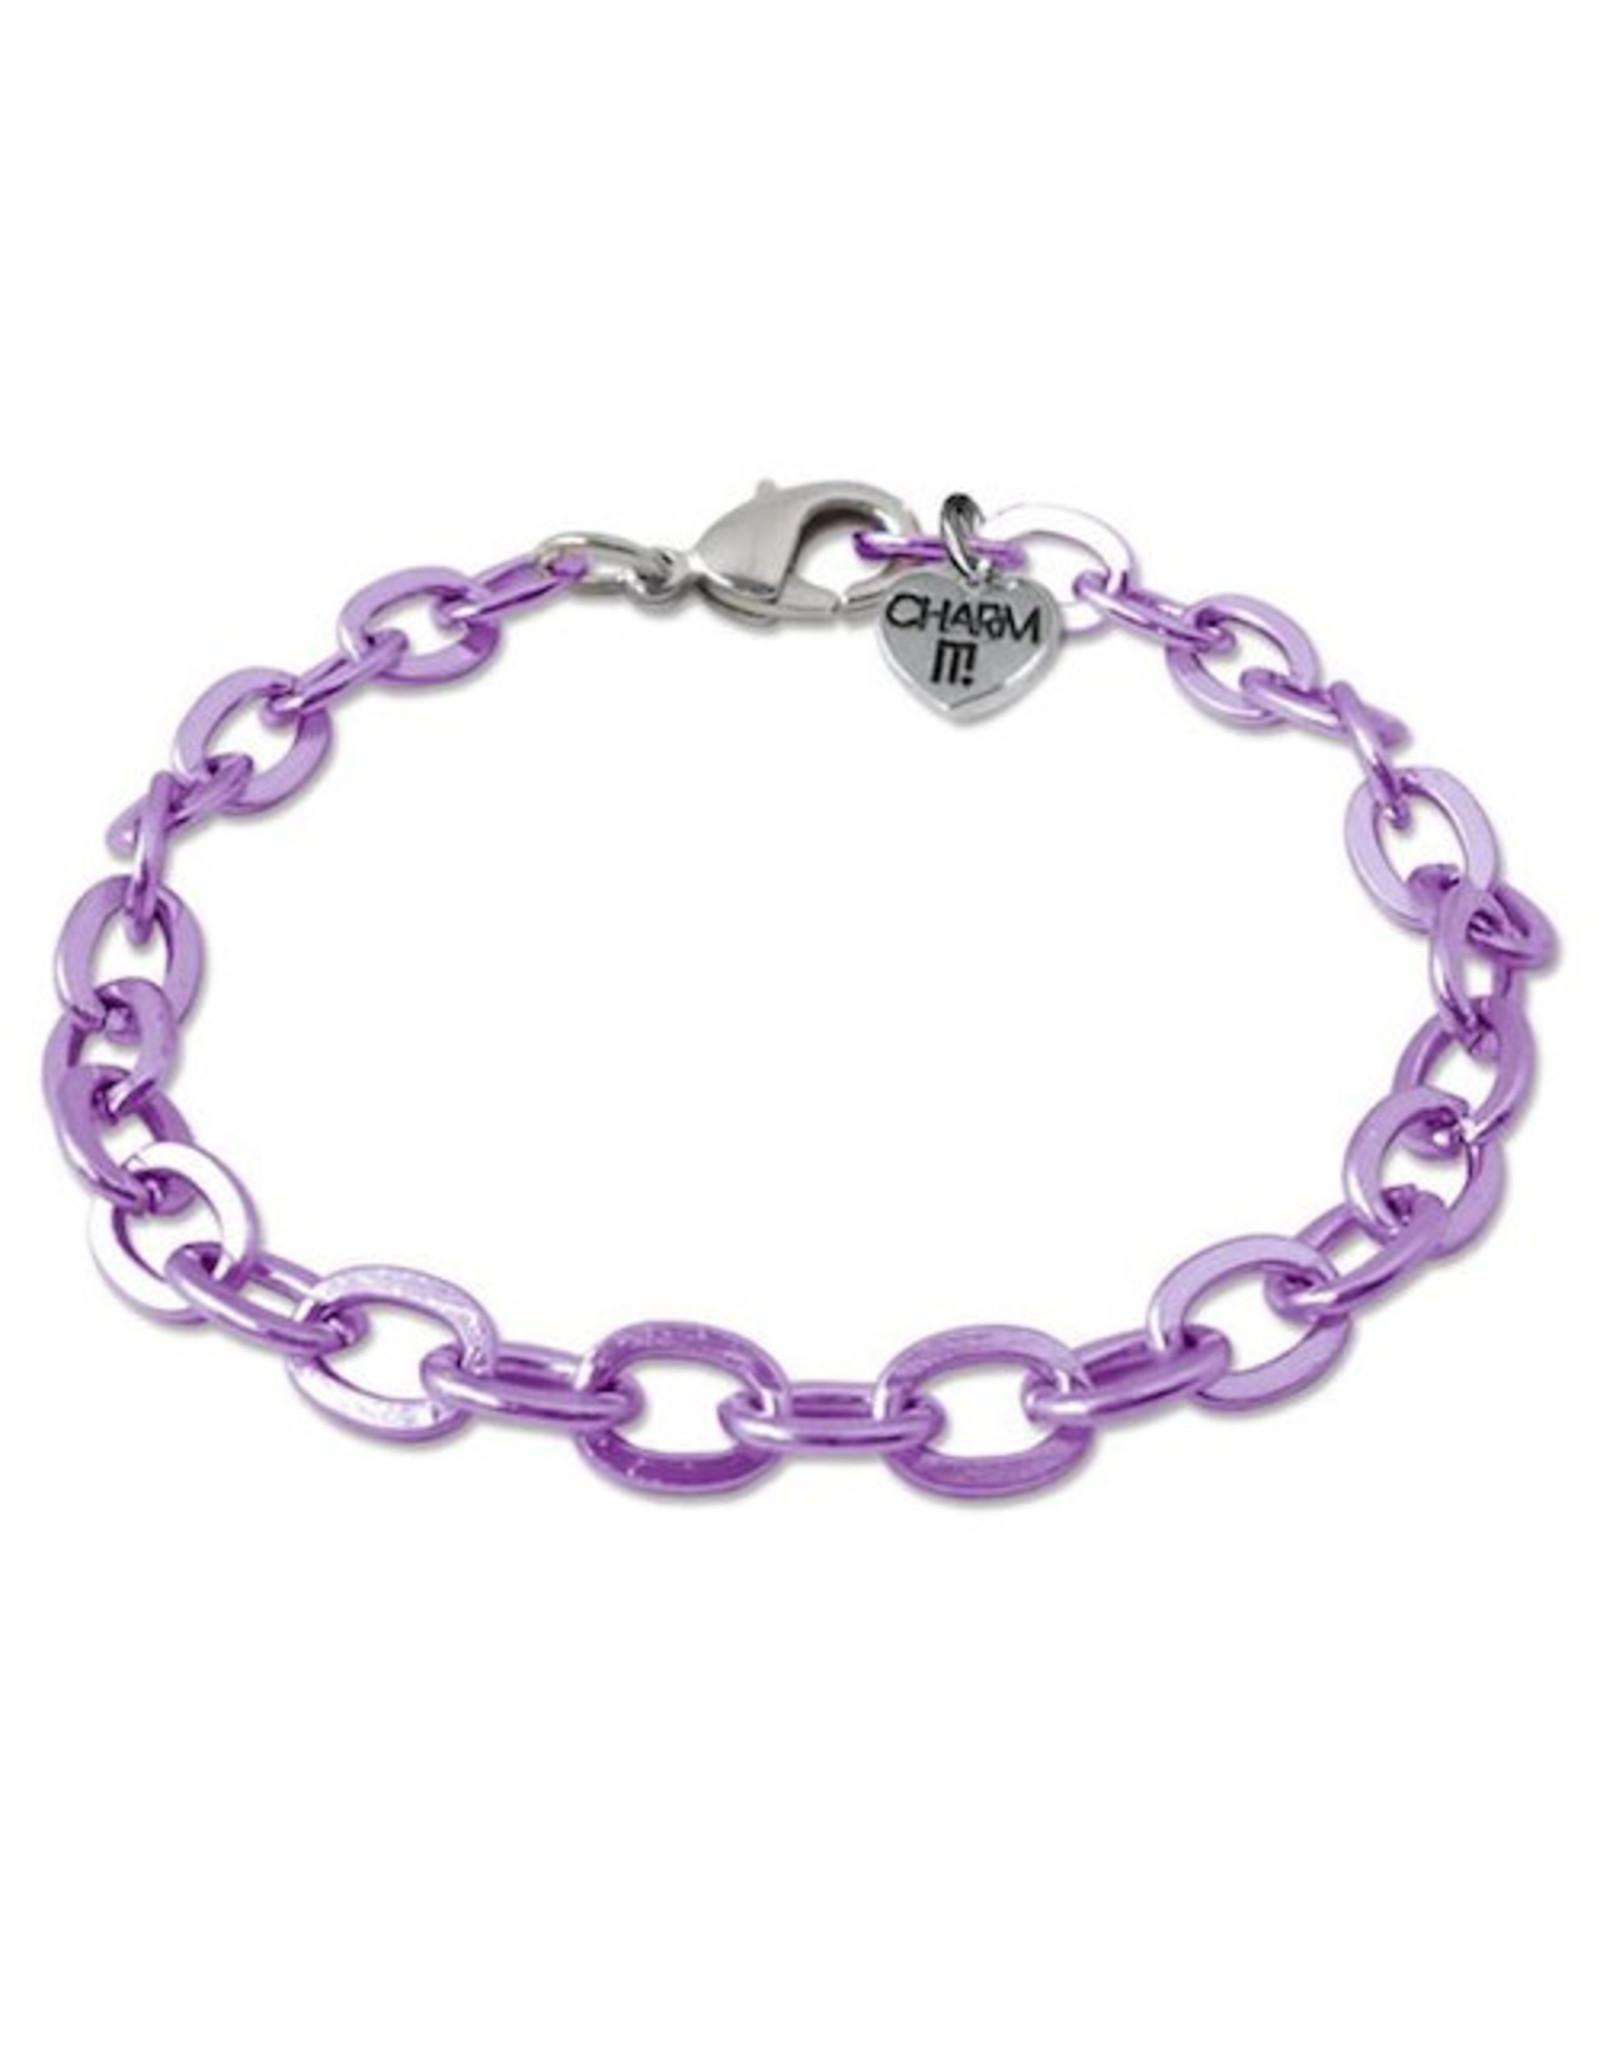 Charm IT Charm It! Bracelet